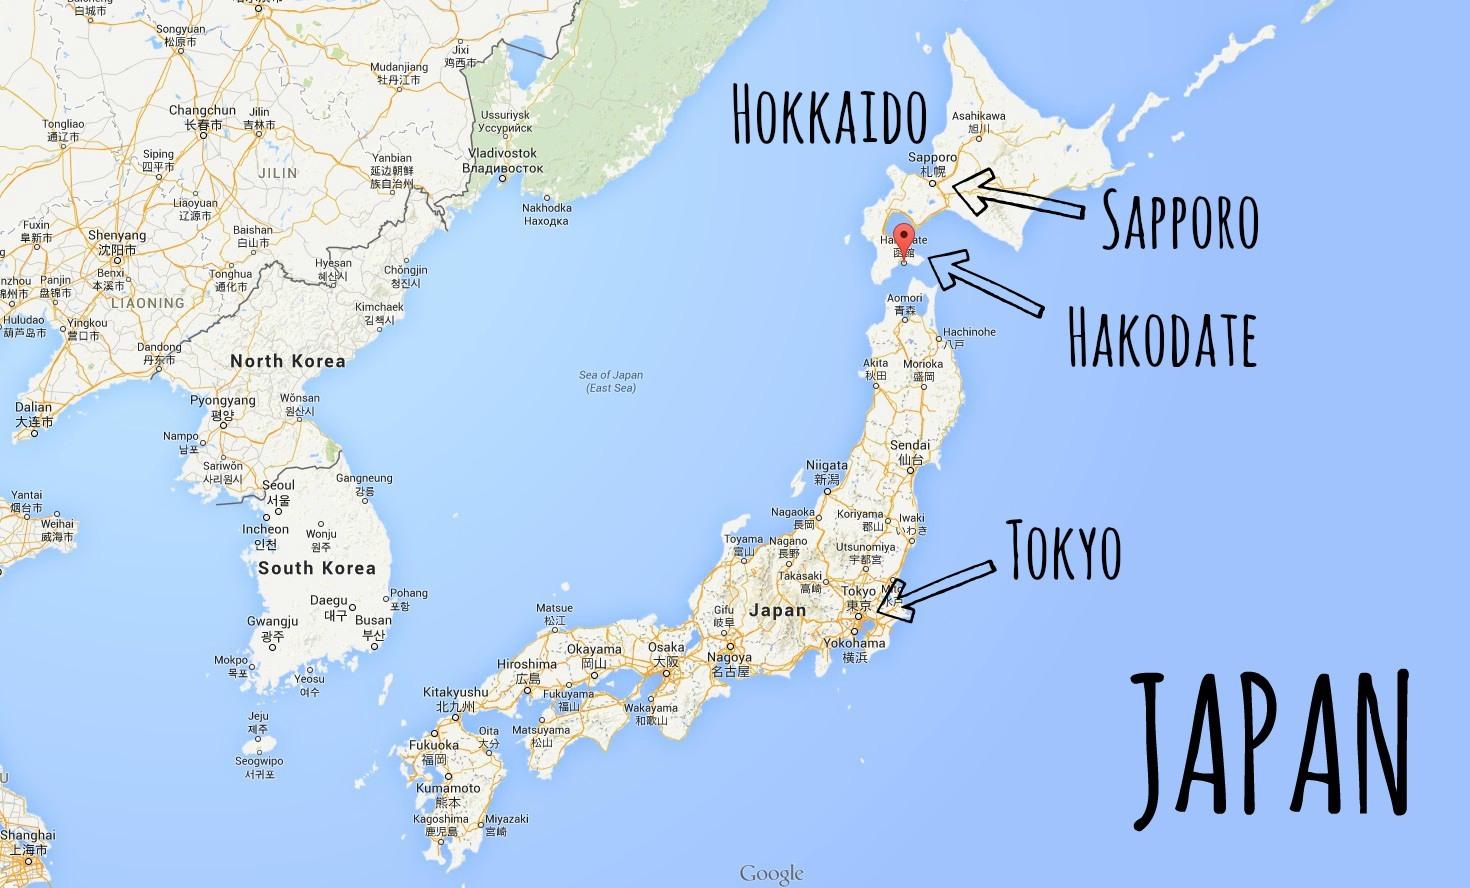 Google Tokyo A Hokkaido Bucket List Adventure Heroes 5 0